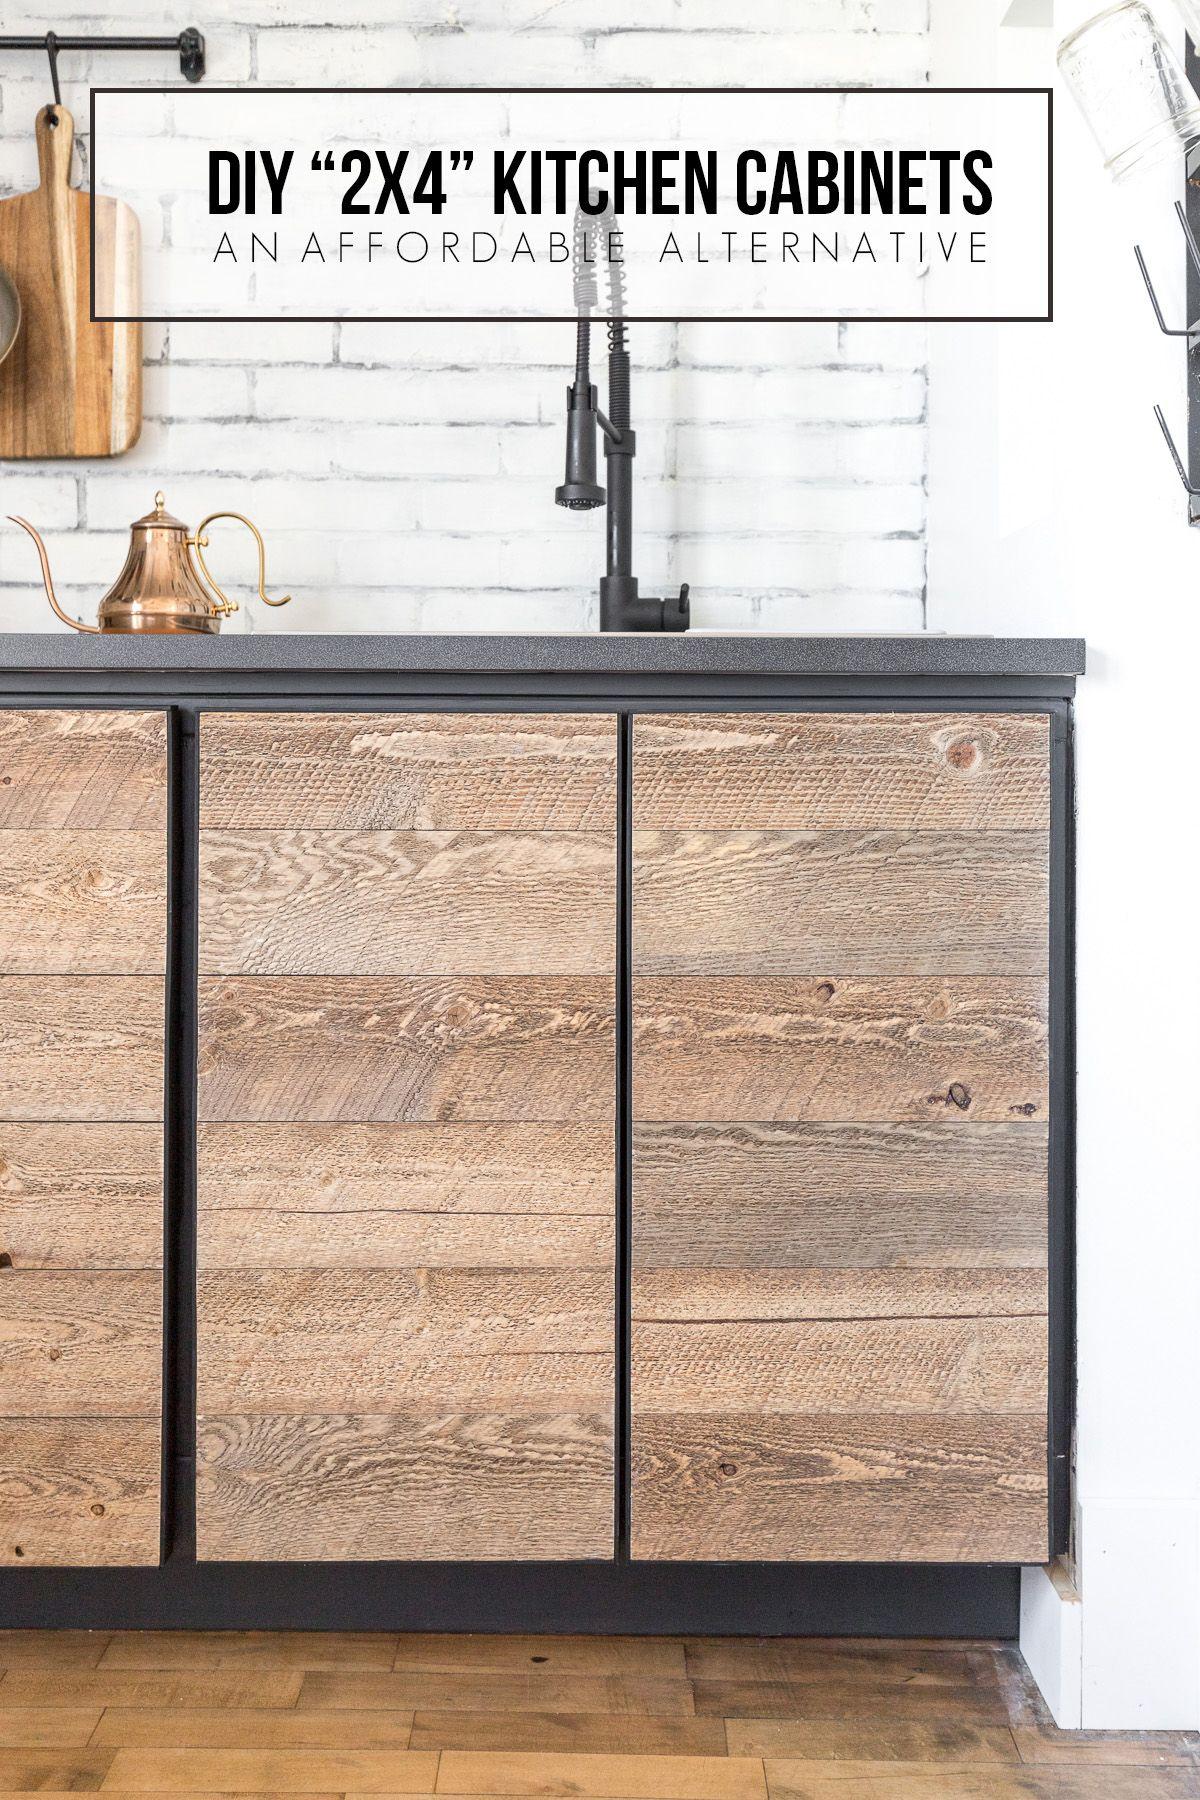 Diy 2x4 Kitchen Cabinets Tutorial Cherished Bliss Diy Cabinet Doors Building Kitchen Cabinets Cheap Kitchen Cabinets